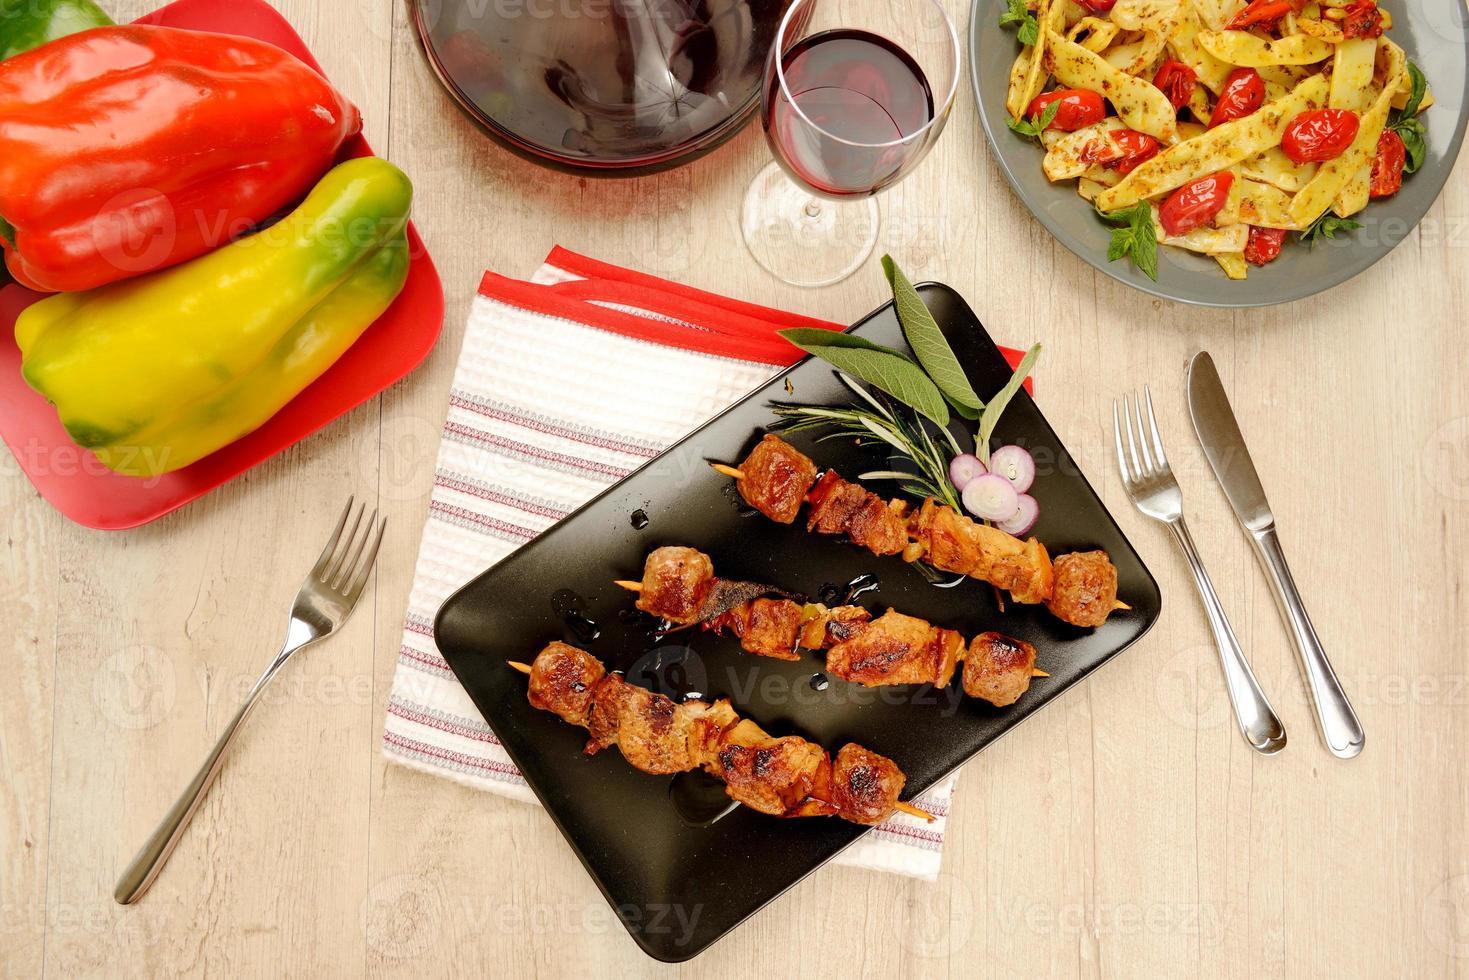 brochetas de carne cocidas listas para comer foto